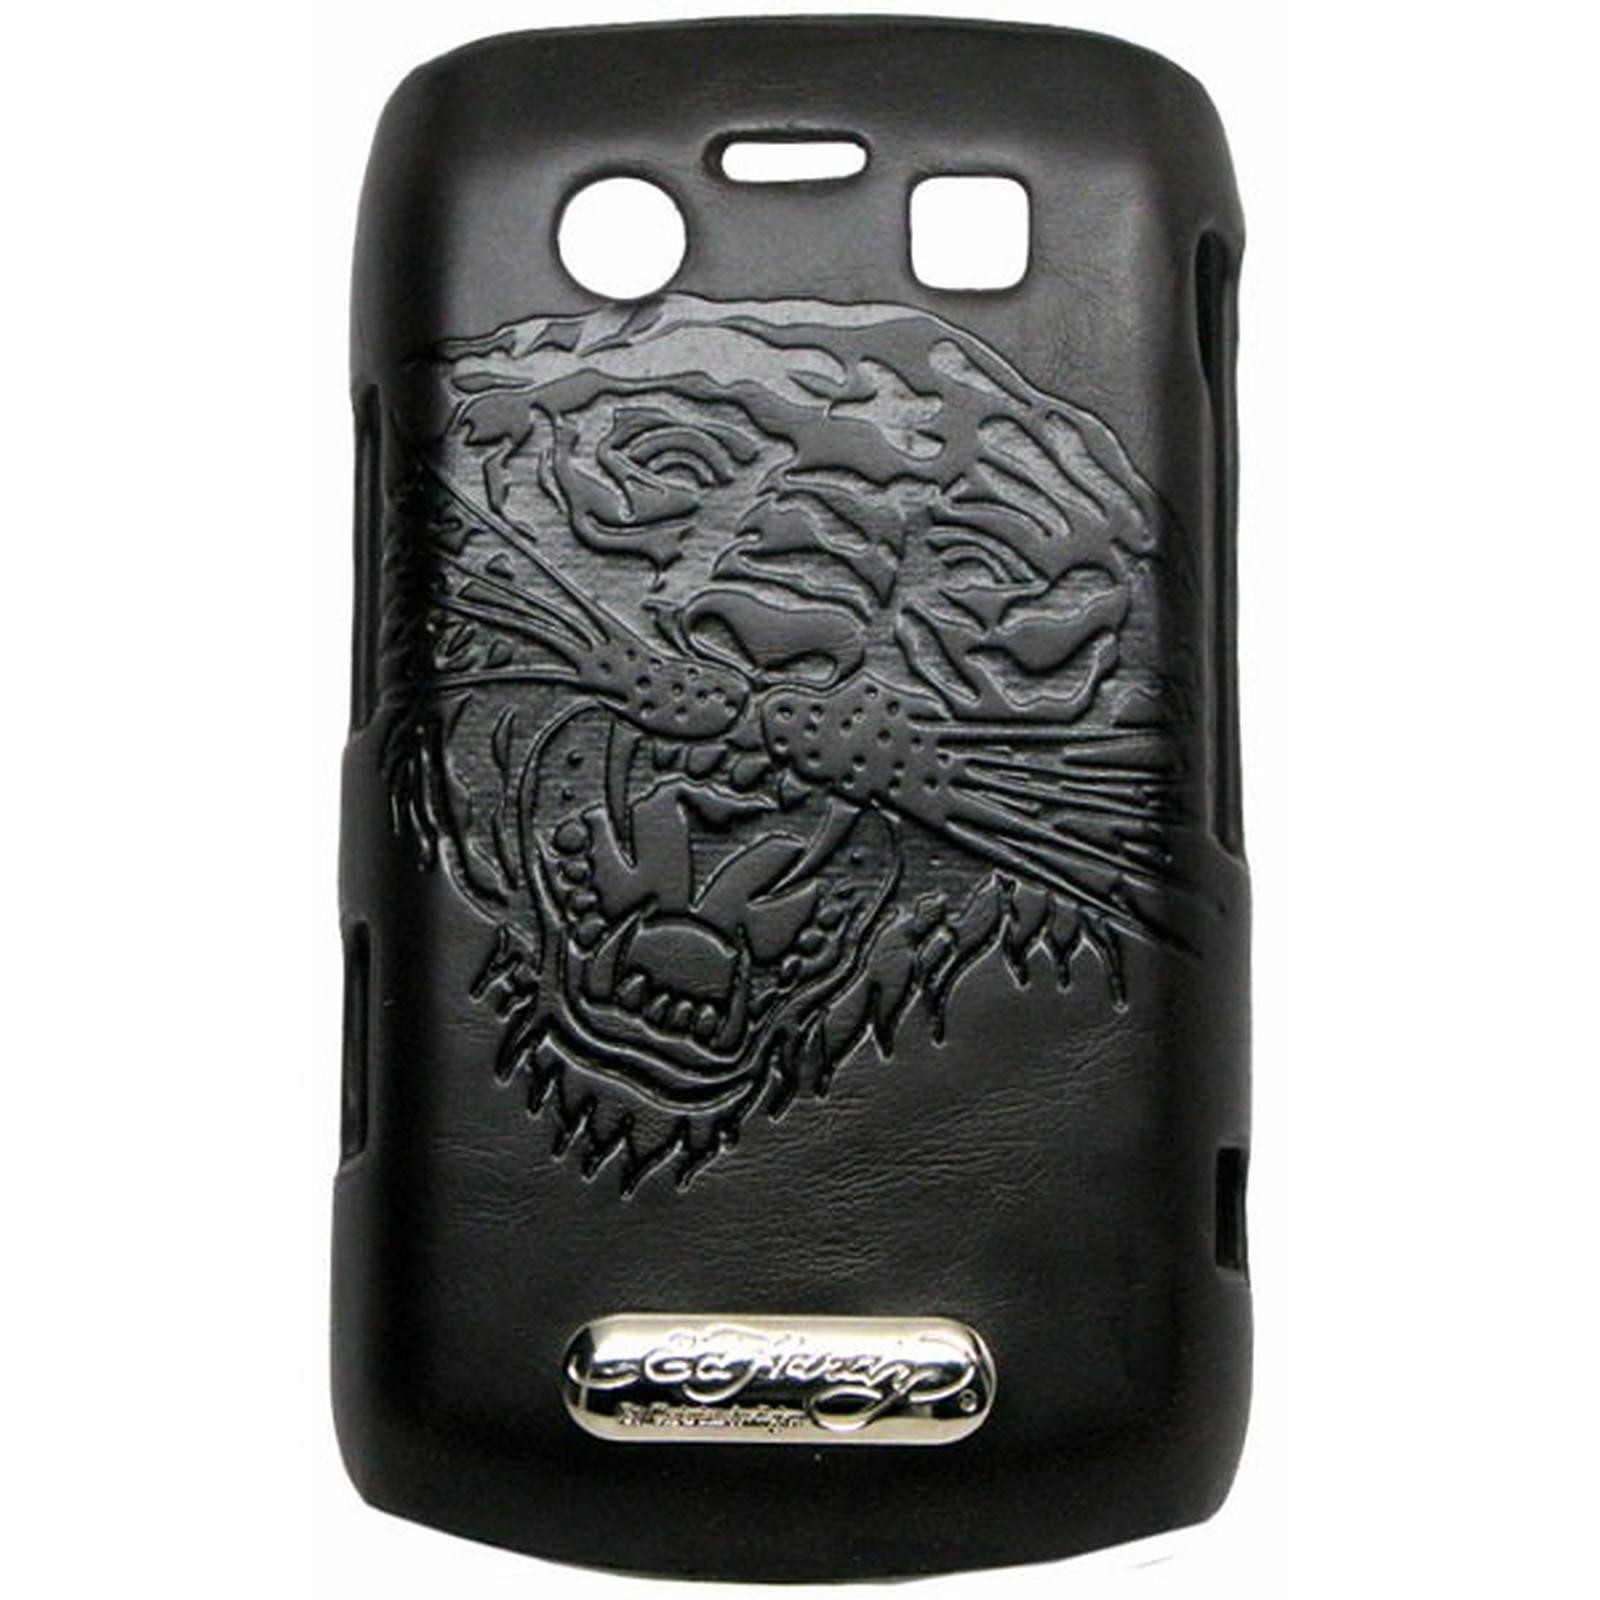 "Ed Hardy - Executive Faceplate BlackBerry Bold 9700 ""Tiger"" Black"